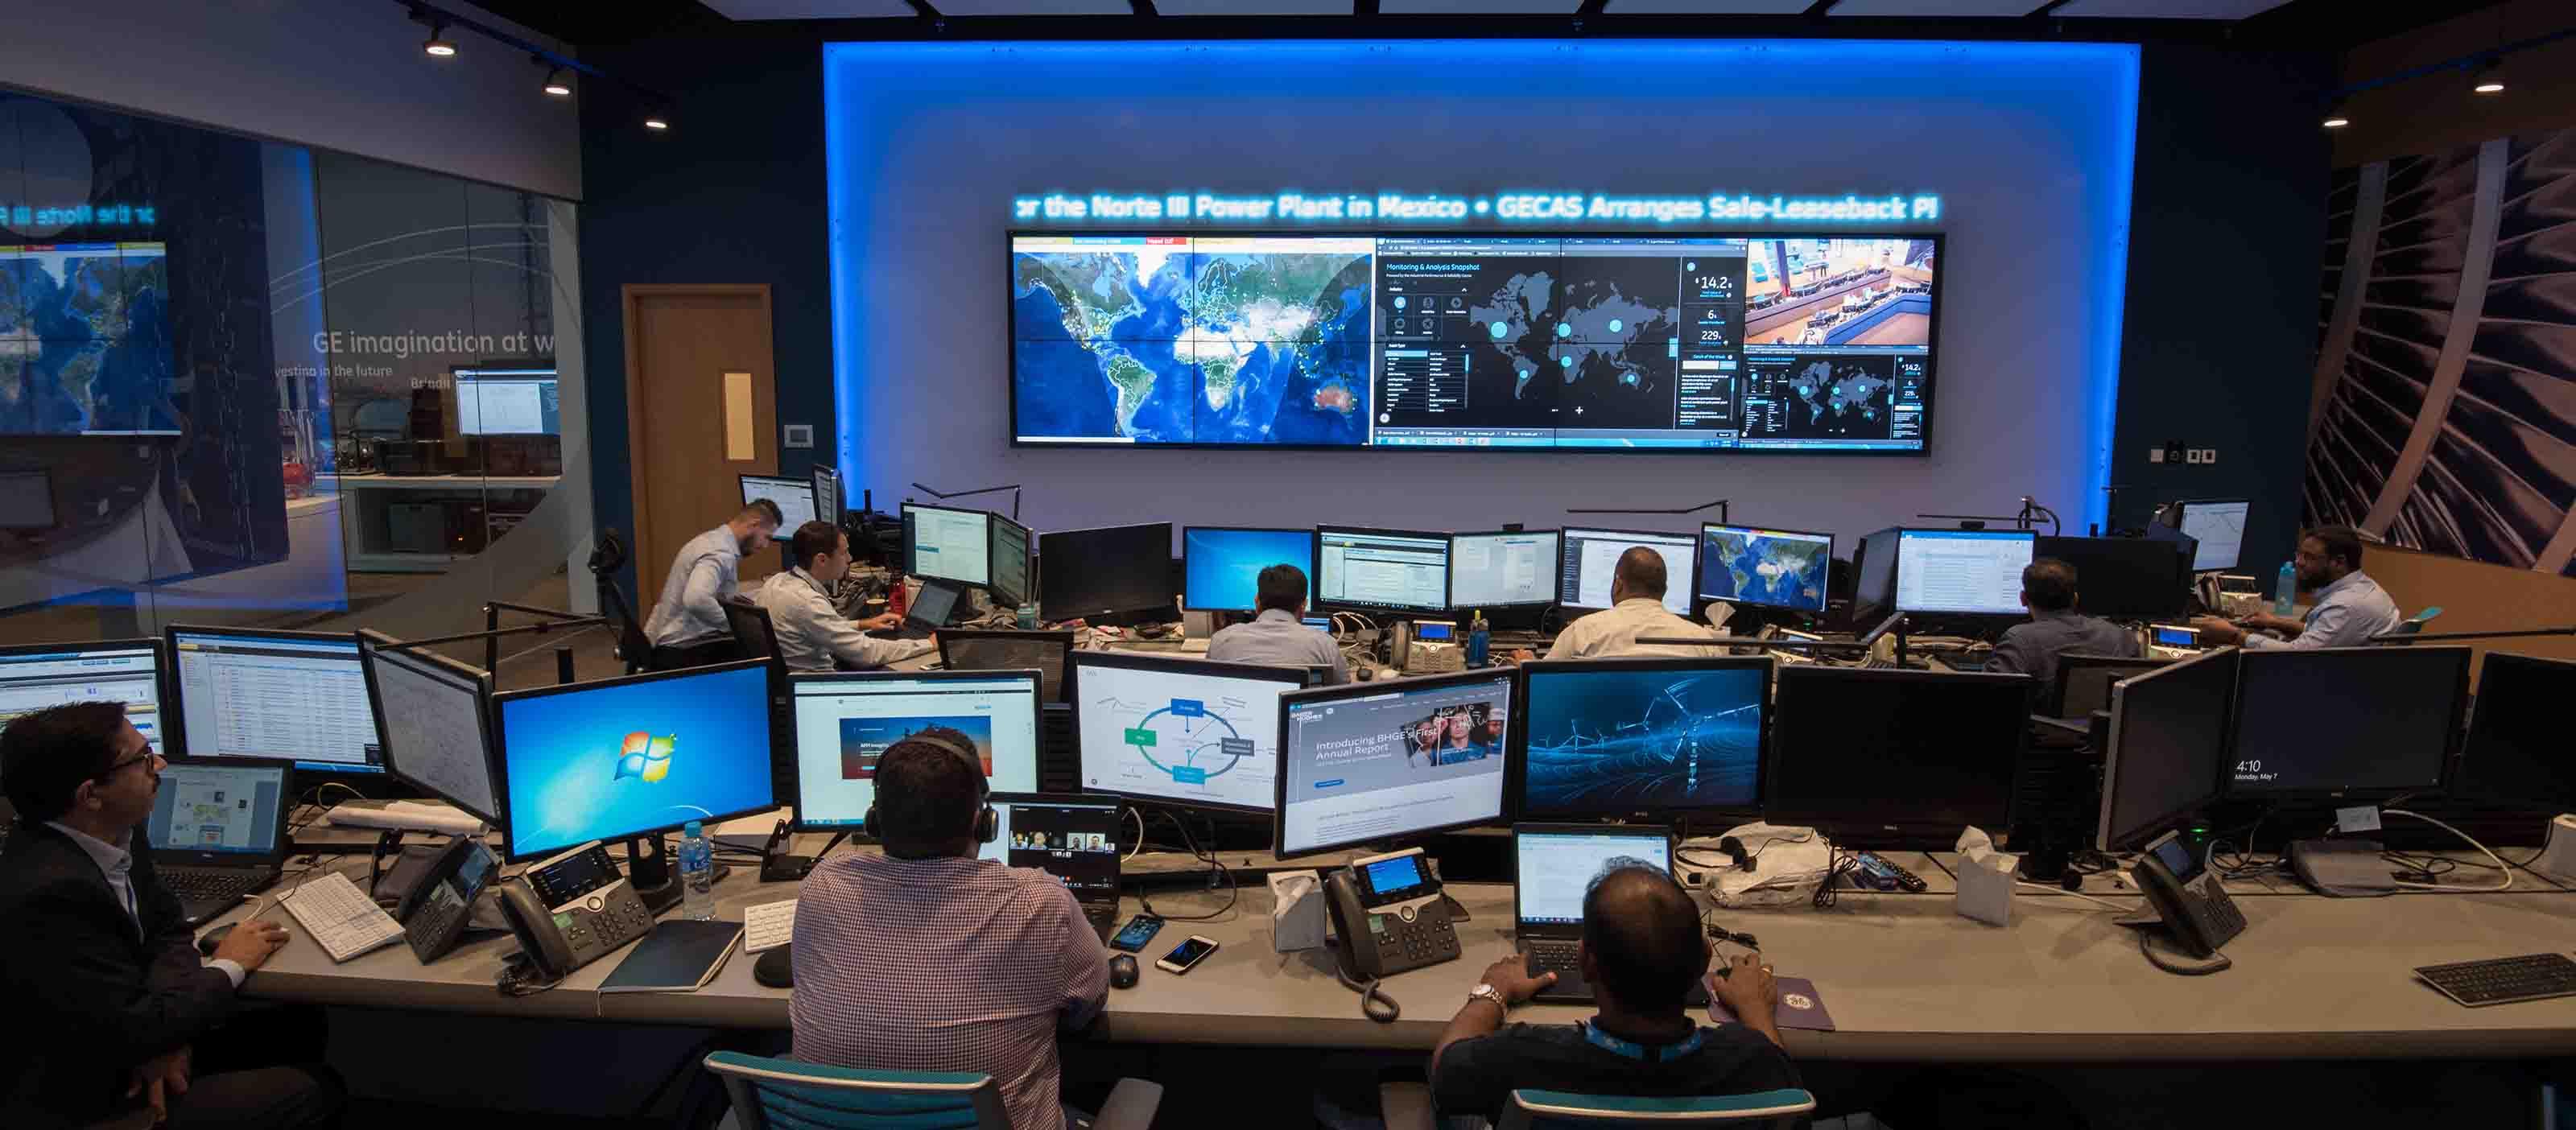 Dubai control center using GE Digital APM solutions   SmartSignal